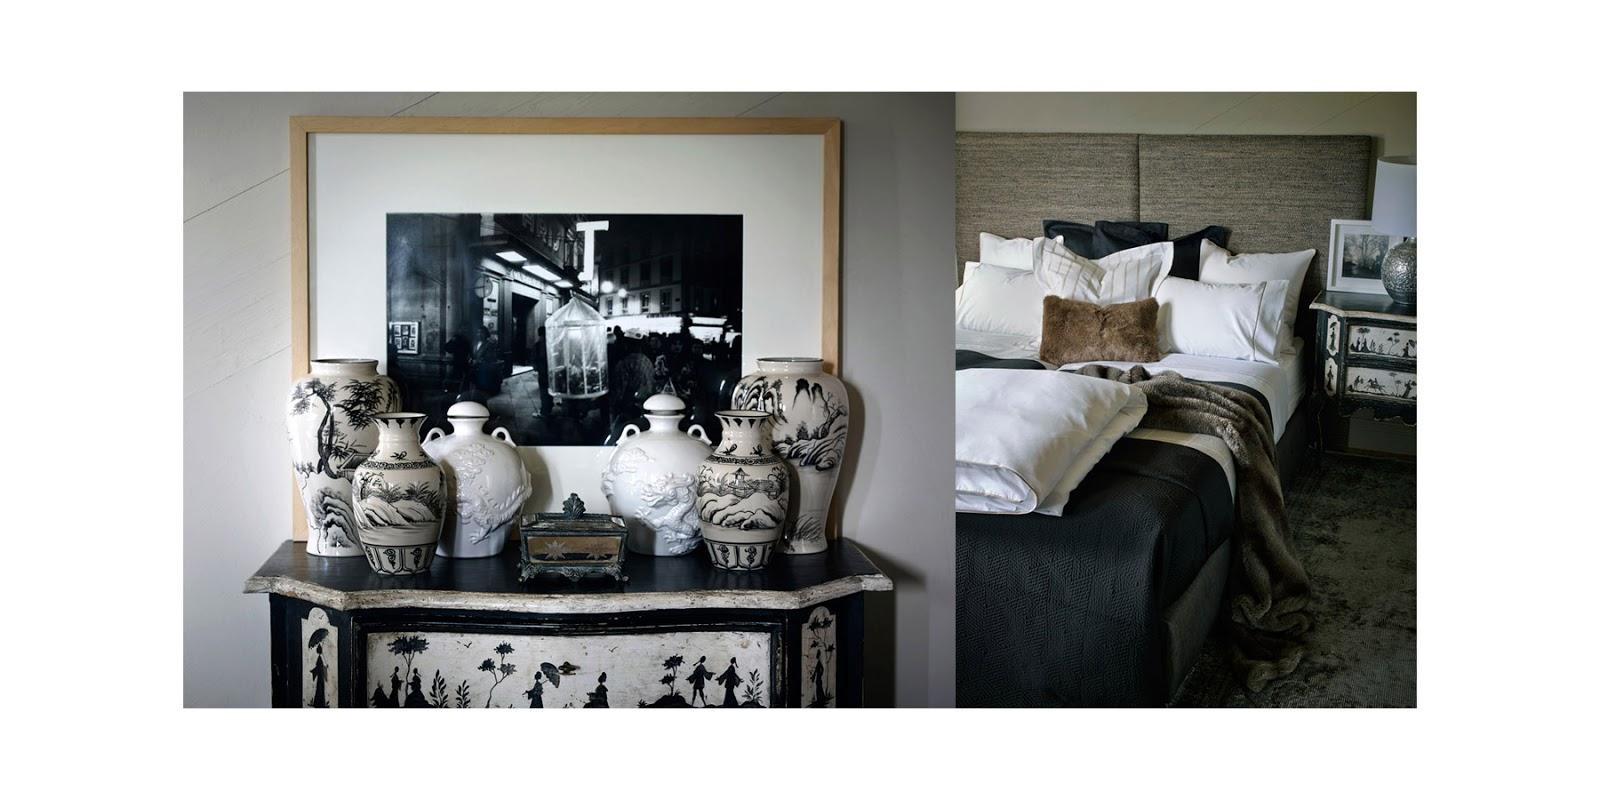 jildou bijsterbosch zara home fall winter 2013 part 3. Black Bedroom Furniture Sets. Home Design Ideas